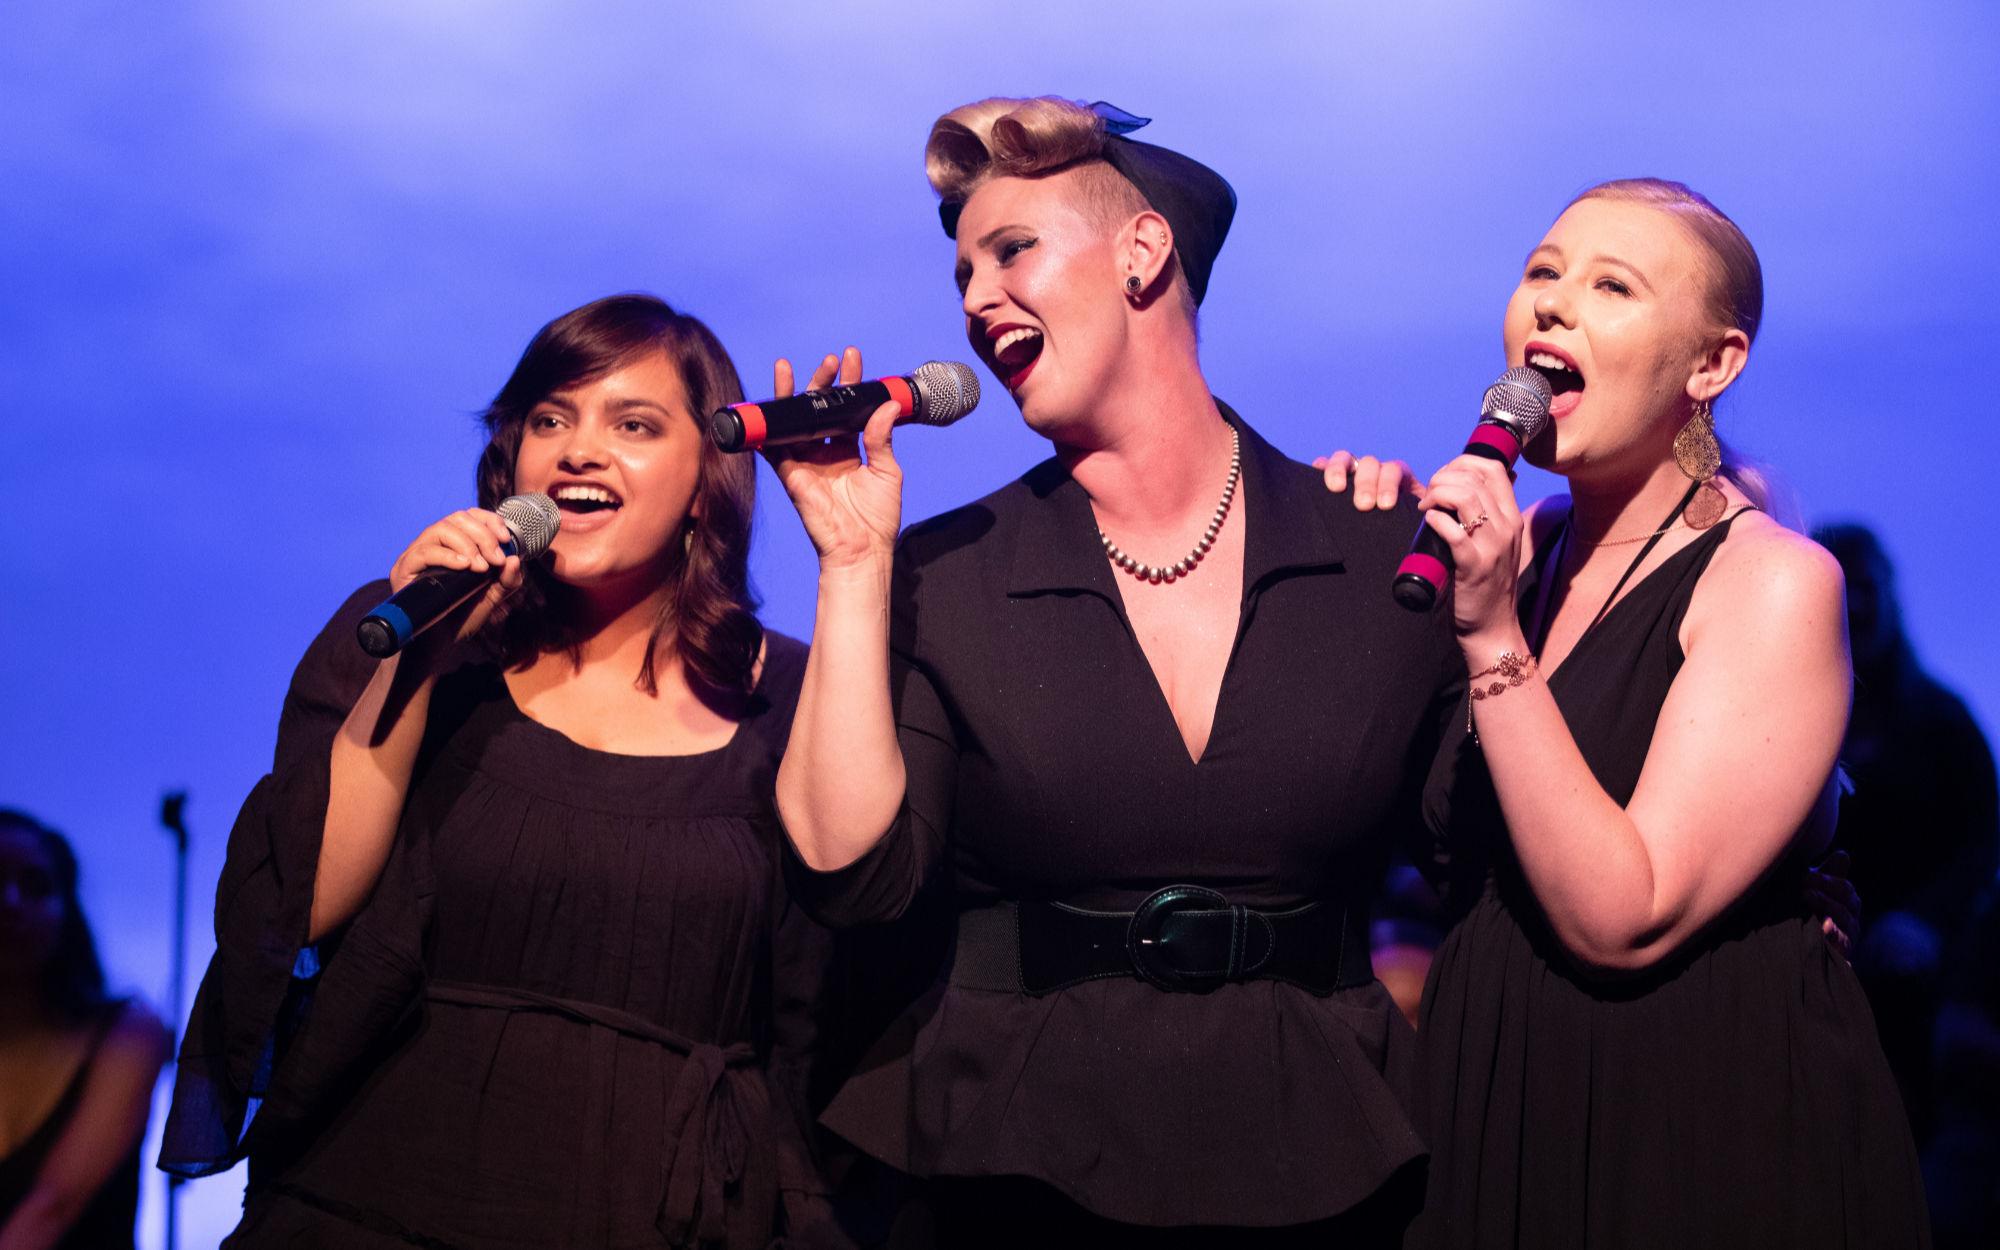 AMDA Gap Programs – Musical Theatre in LA